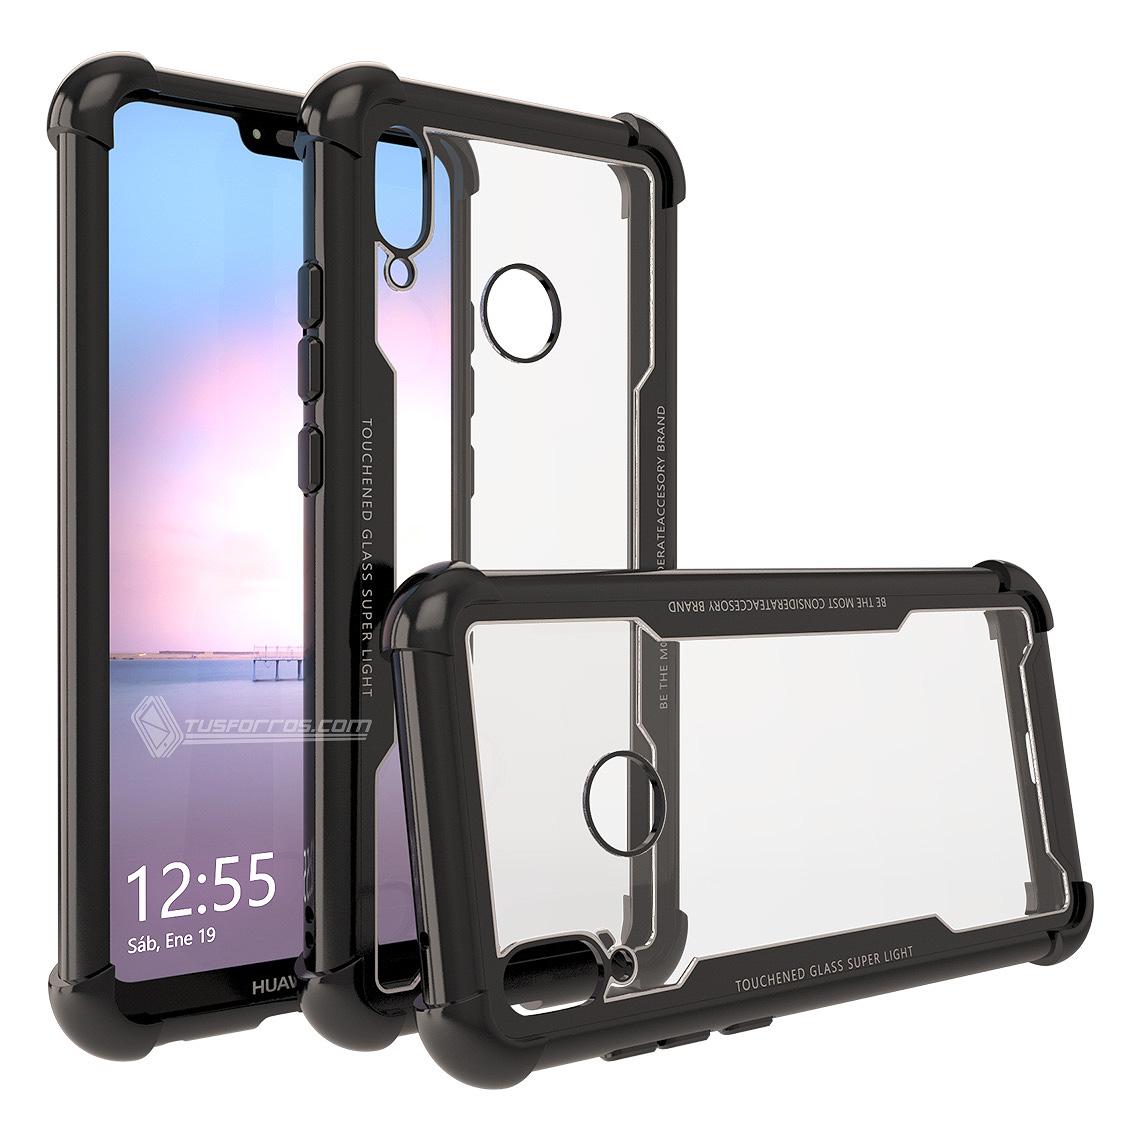 Huawei P20 Lite Forro Anti-Shock Edge Black BackCover Cristal Clear